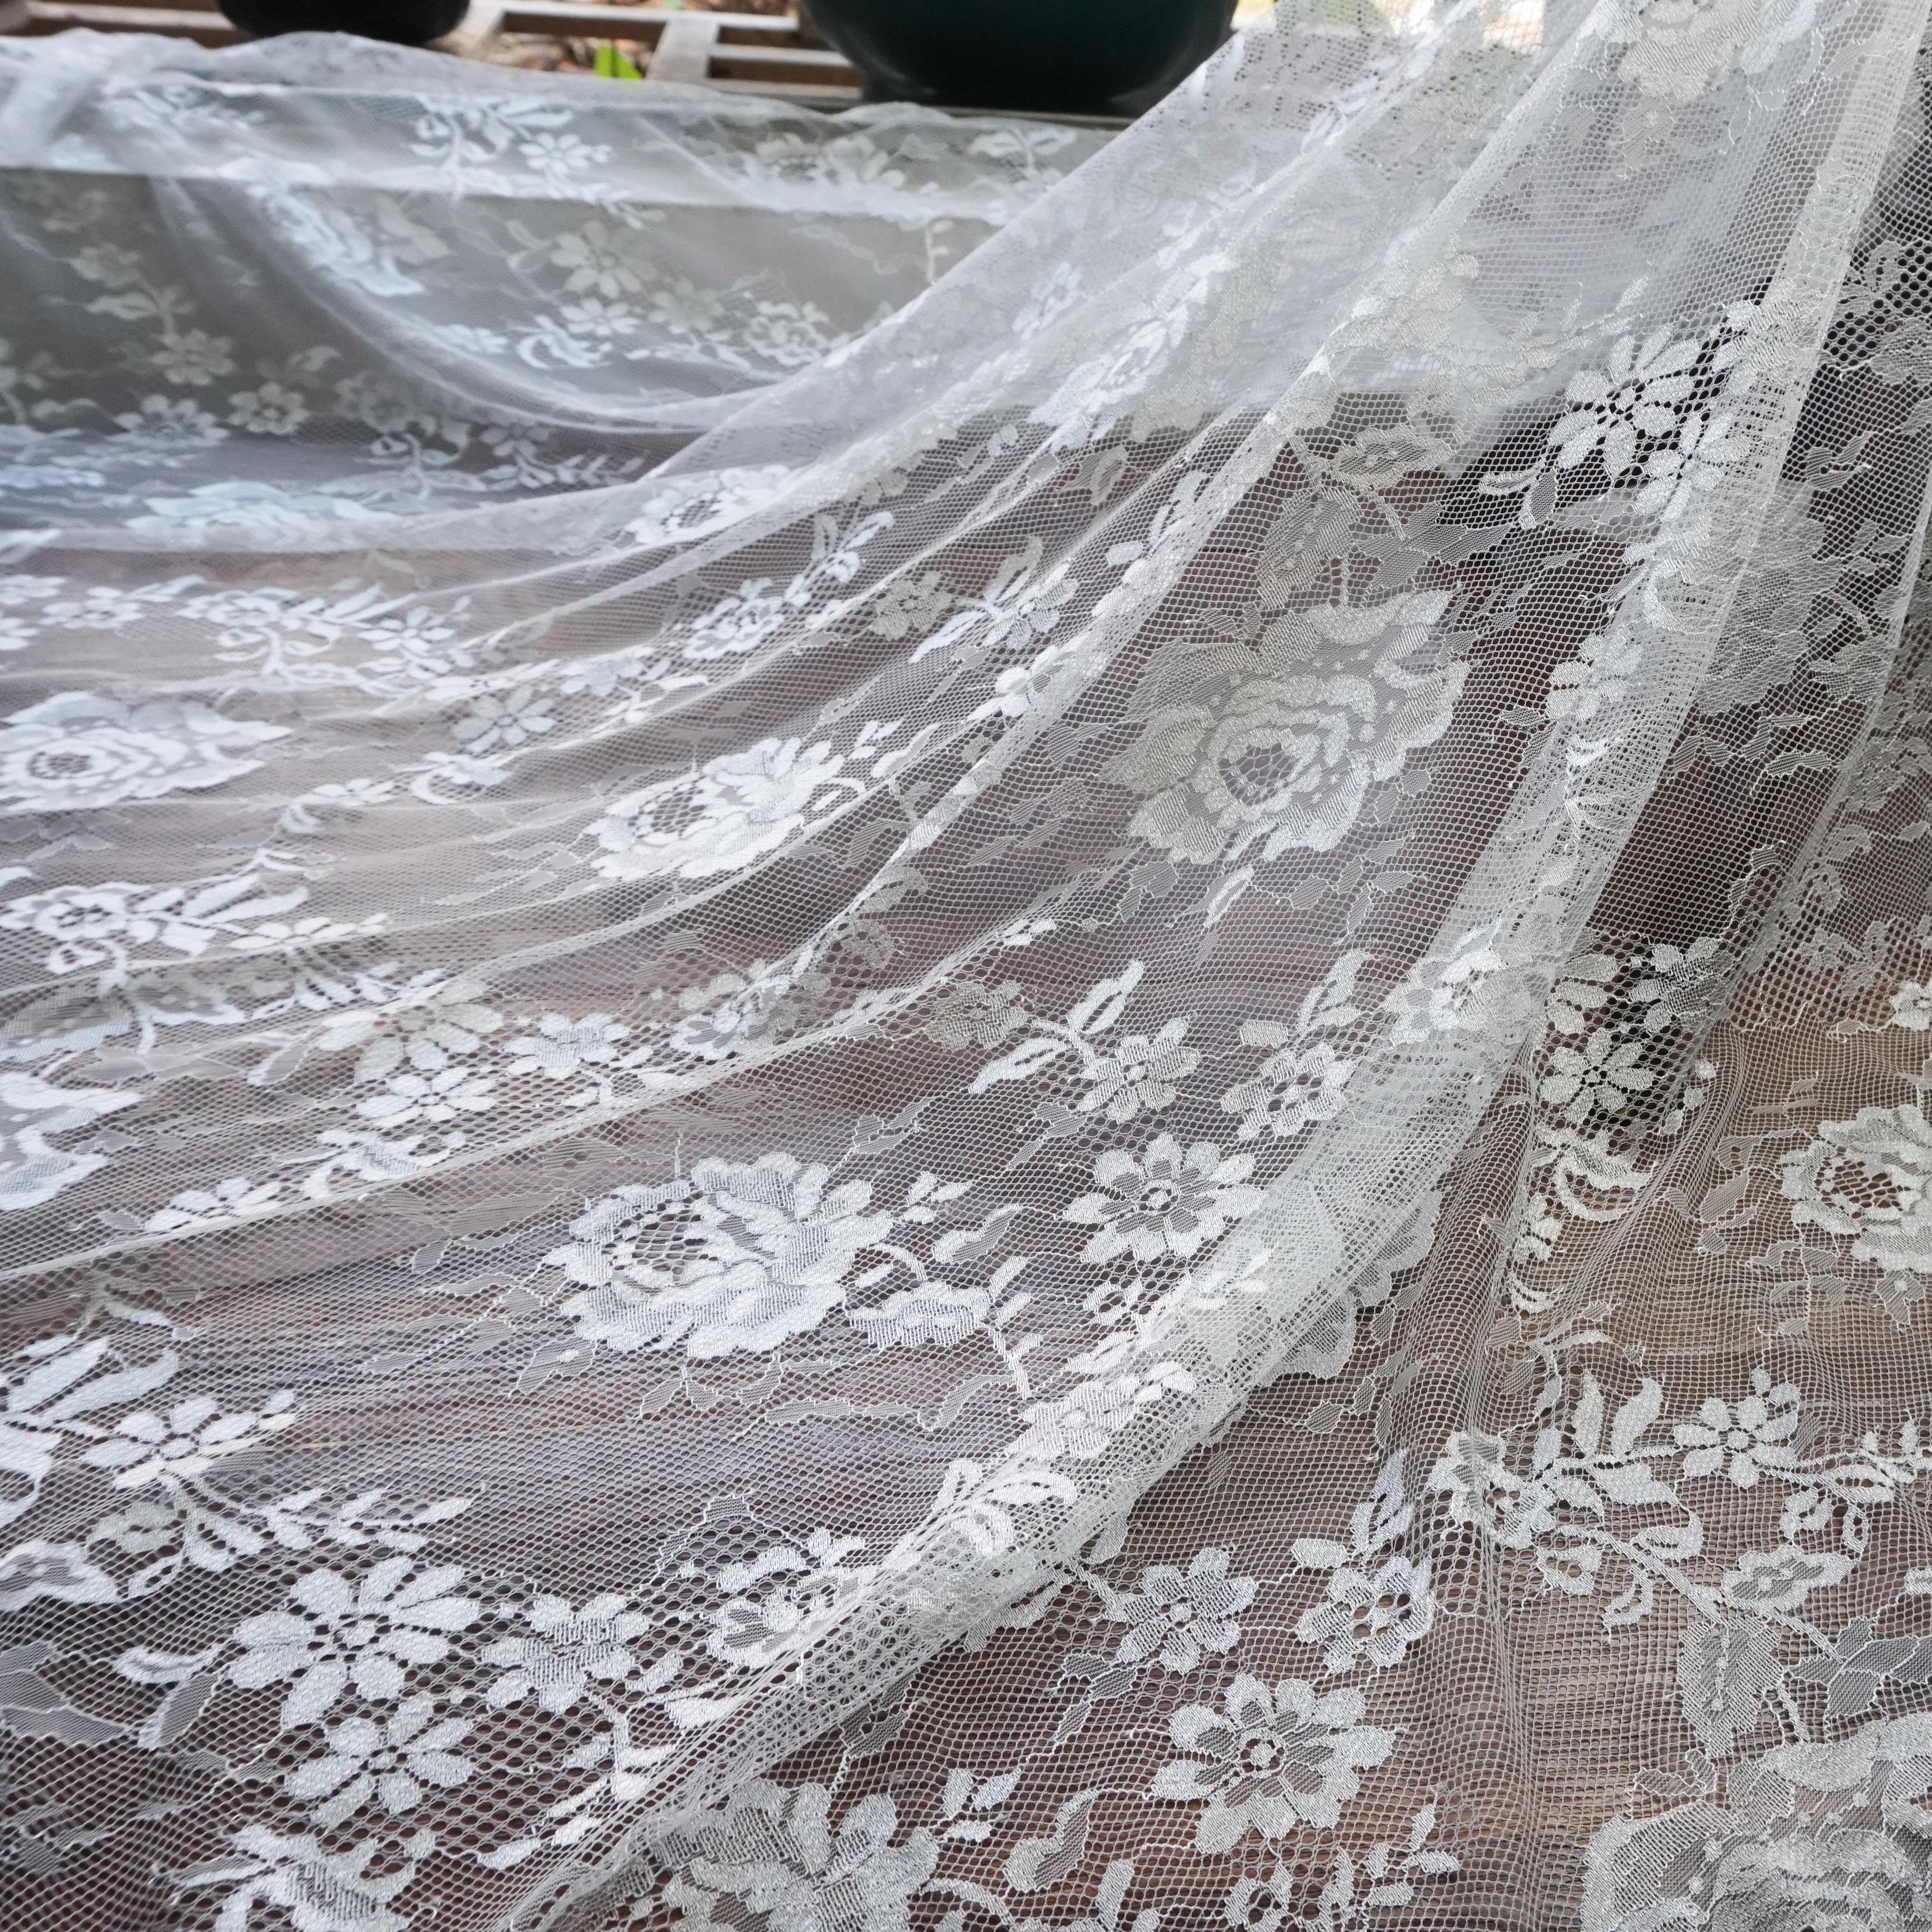 Lace Eyelash Inelastic Mesh Fabric DIY Bridal Wedding Dress Making Materials